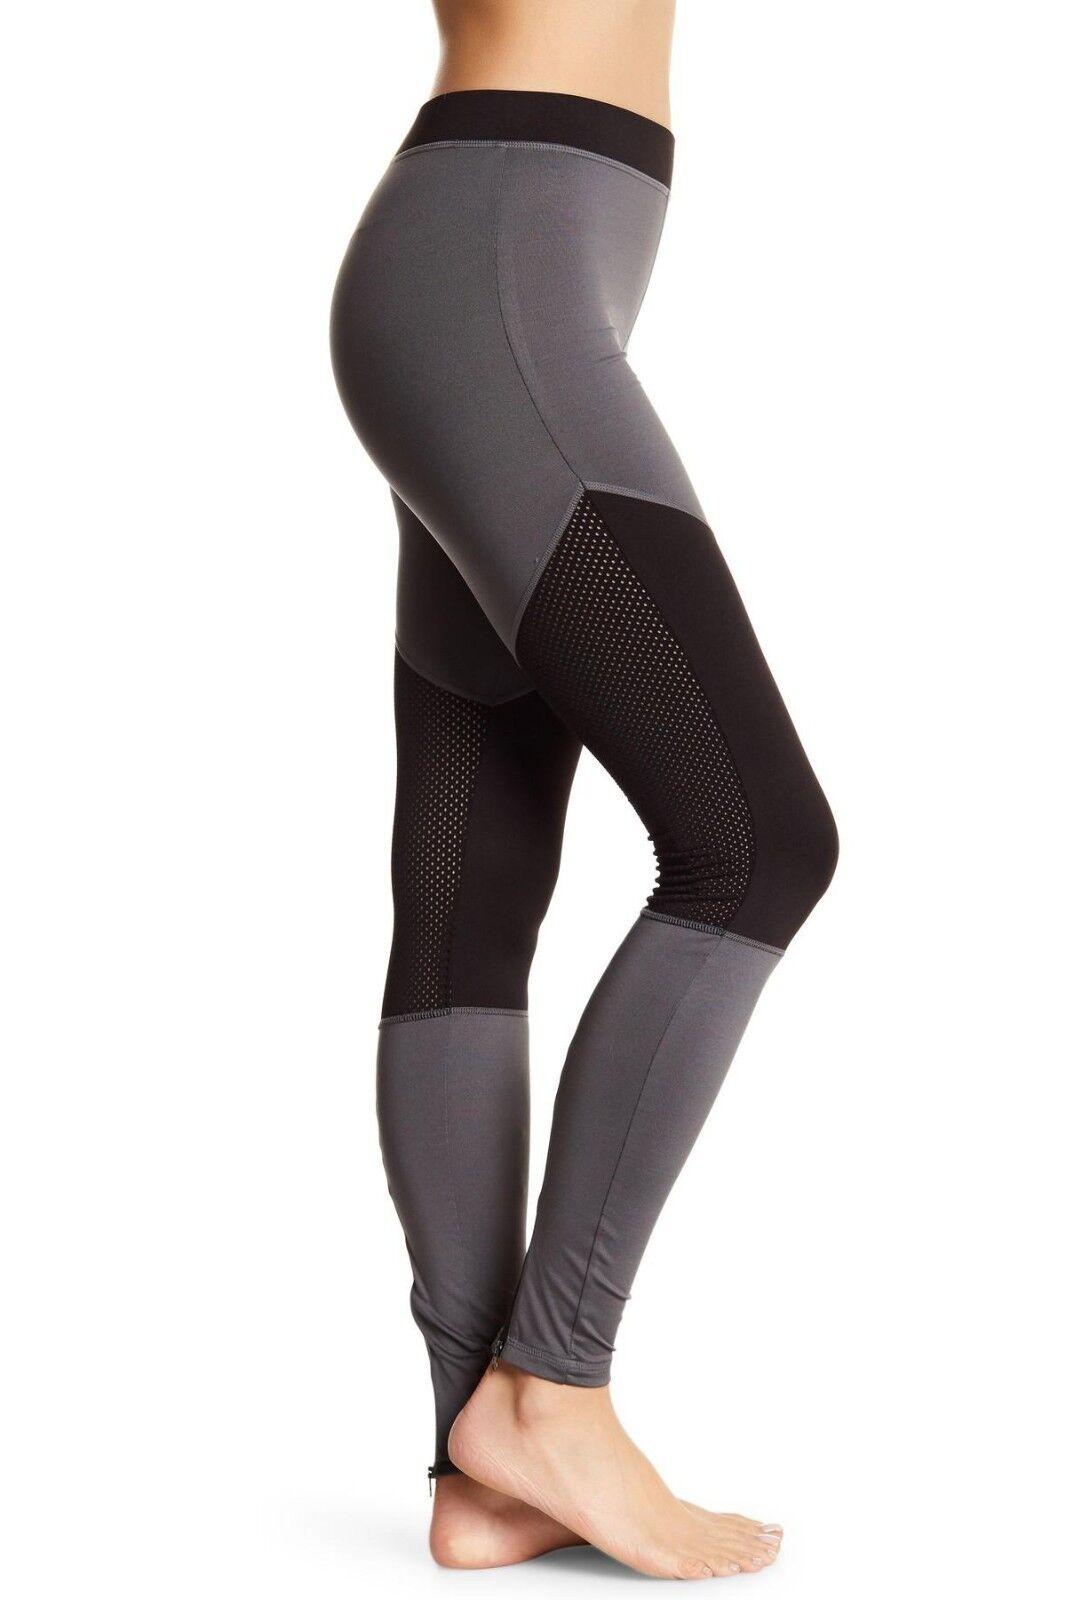 10fb4e8a146cf8 Hue Leggings Sz M Castlerock Grey Moto Mesh Active Jersey Workout Legging  U17536